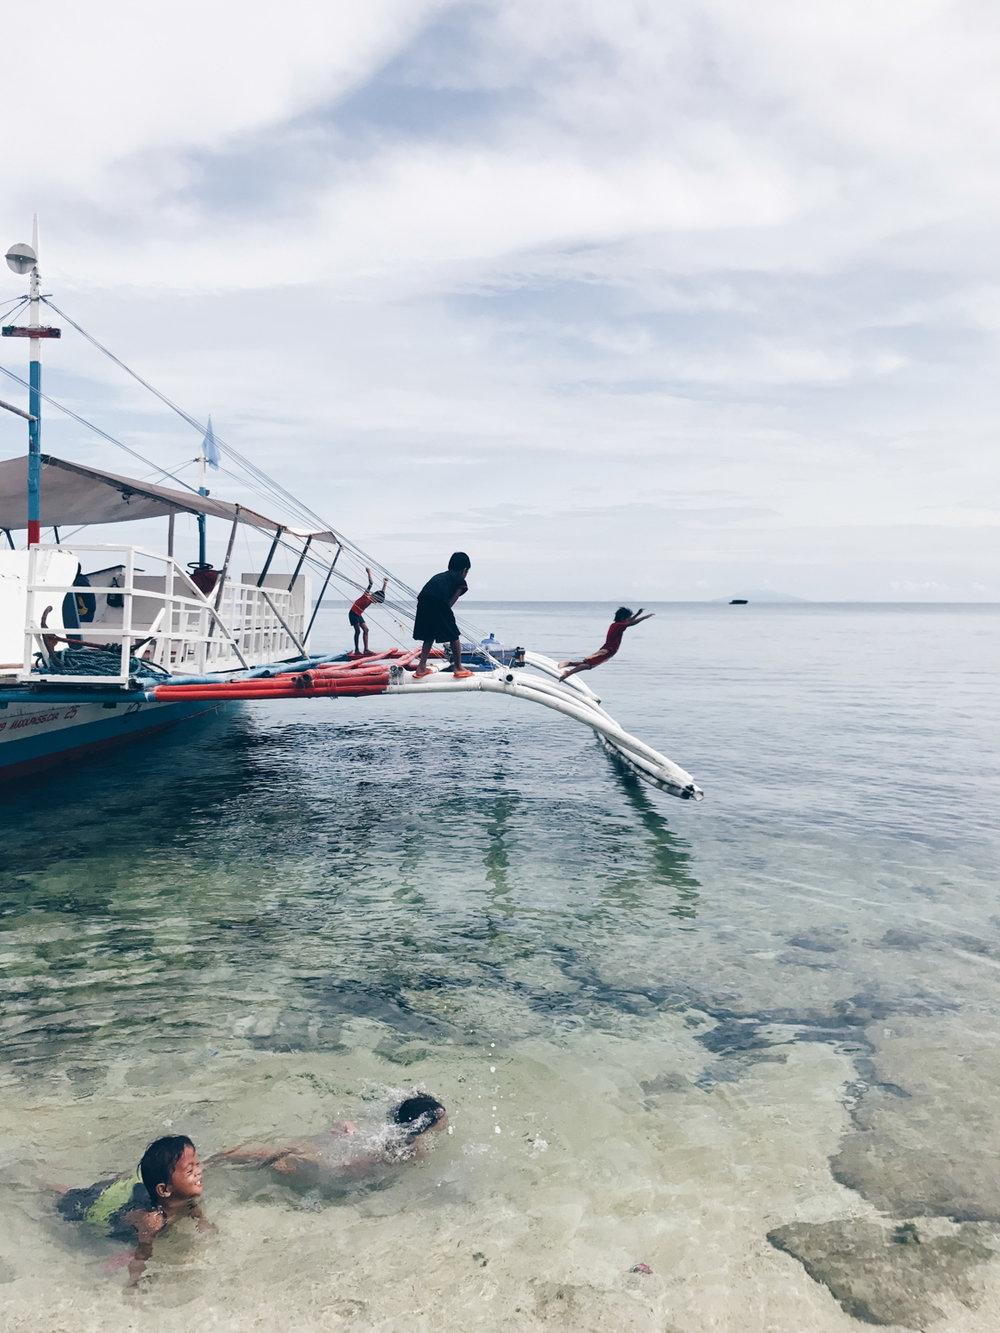 marina_philippines_malapascua04.jpg